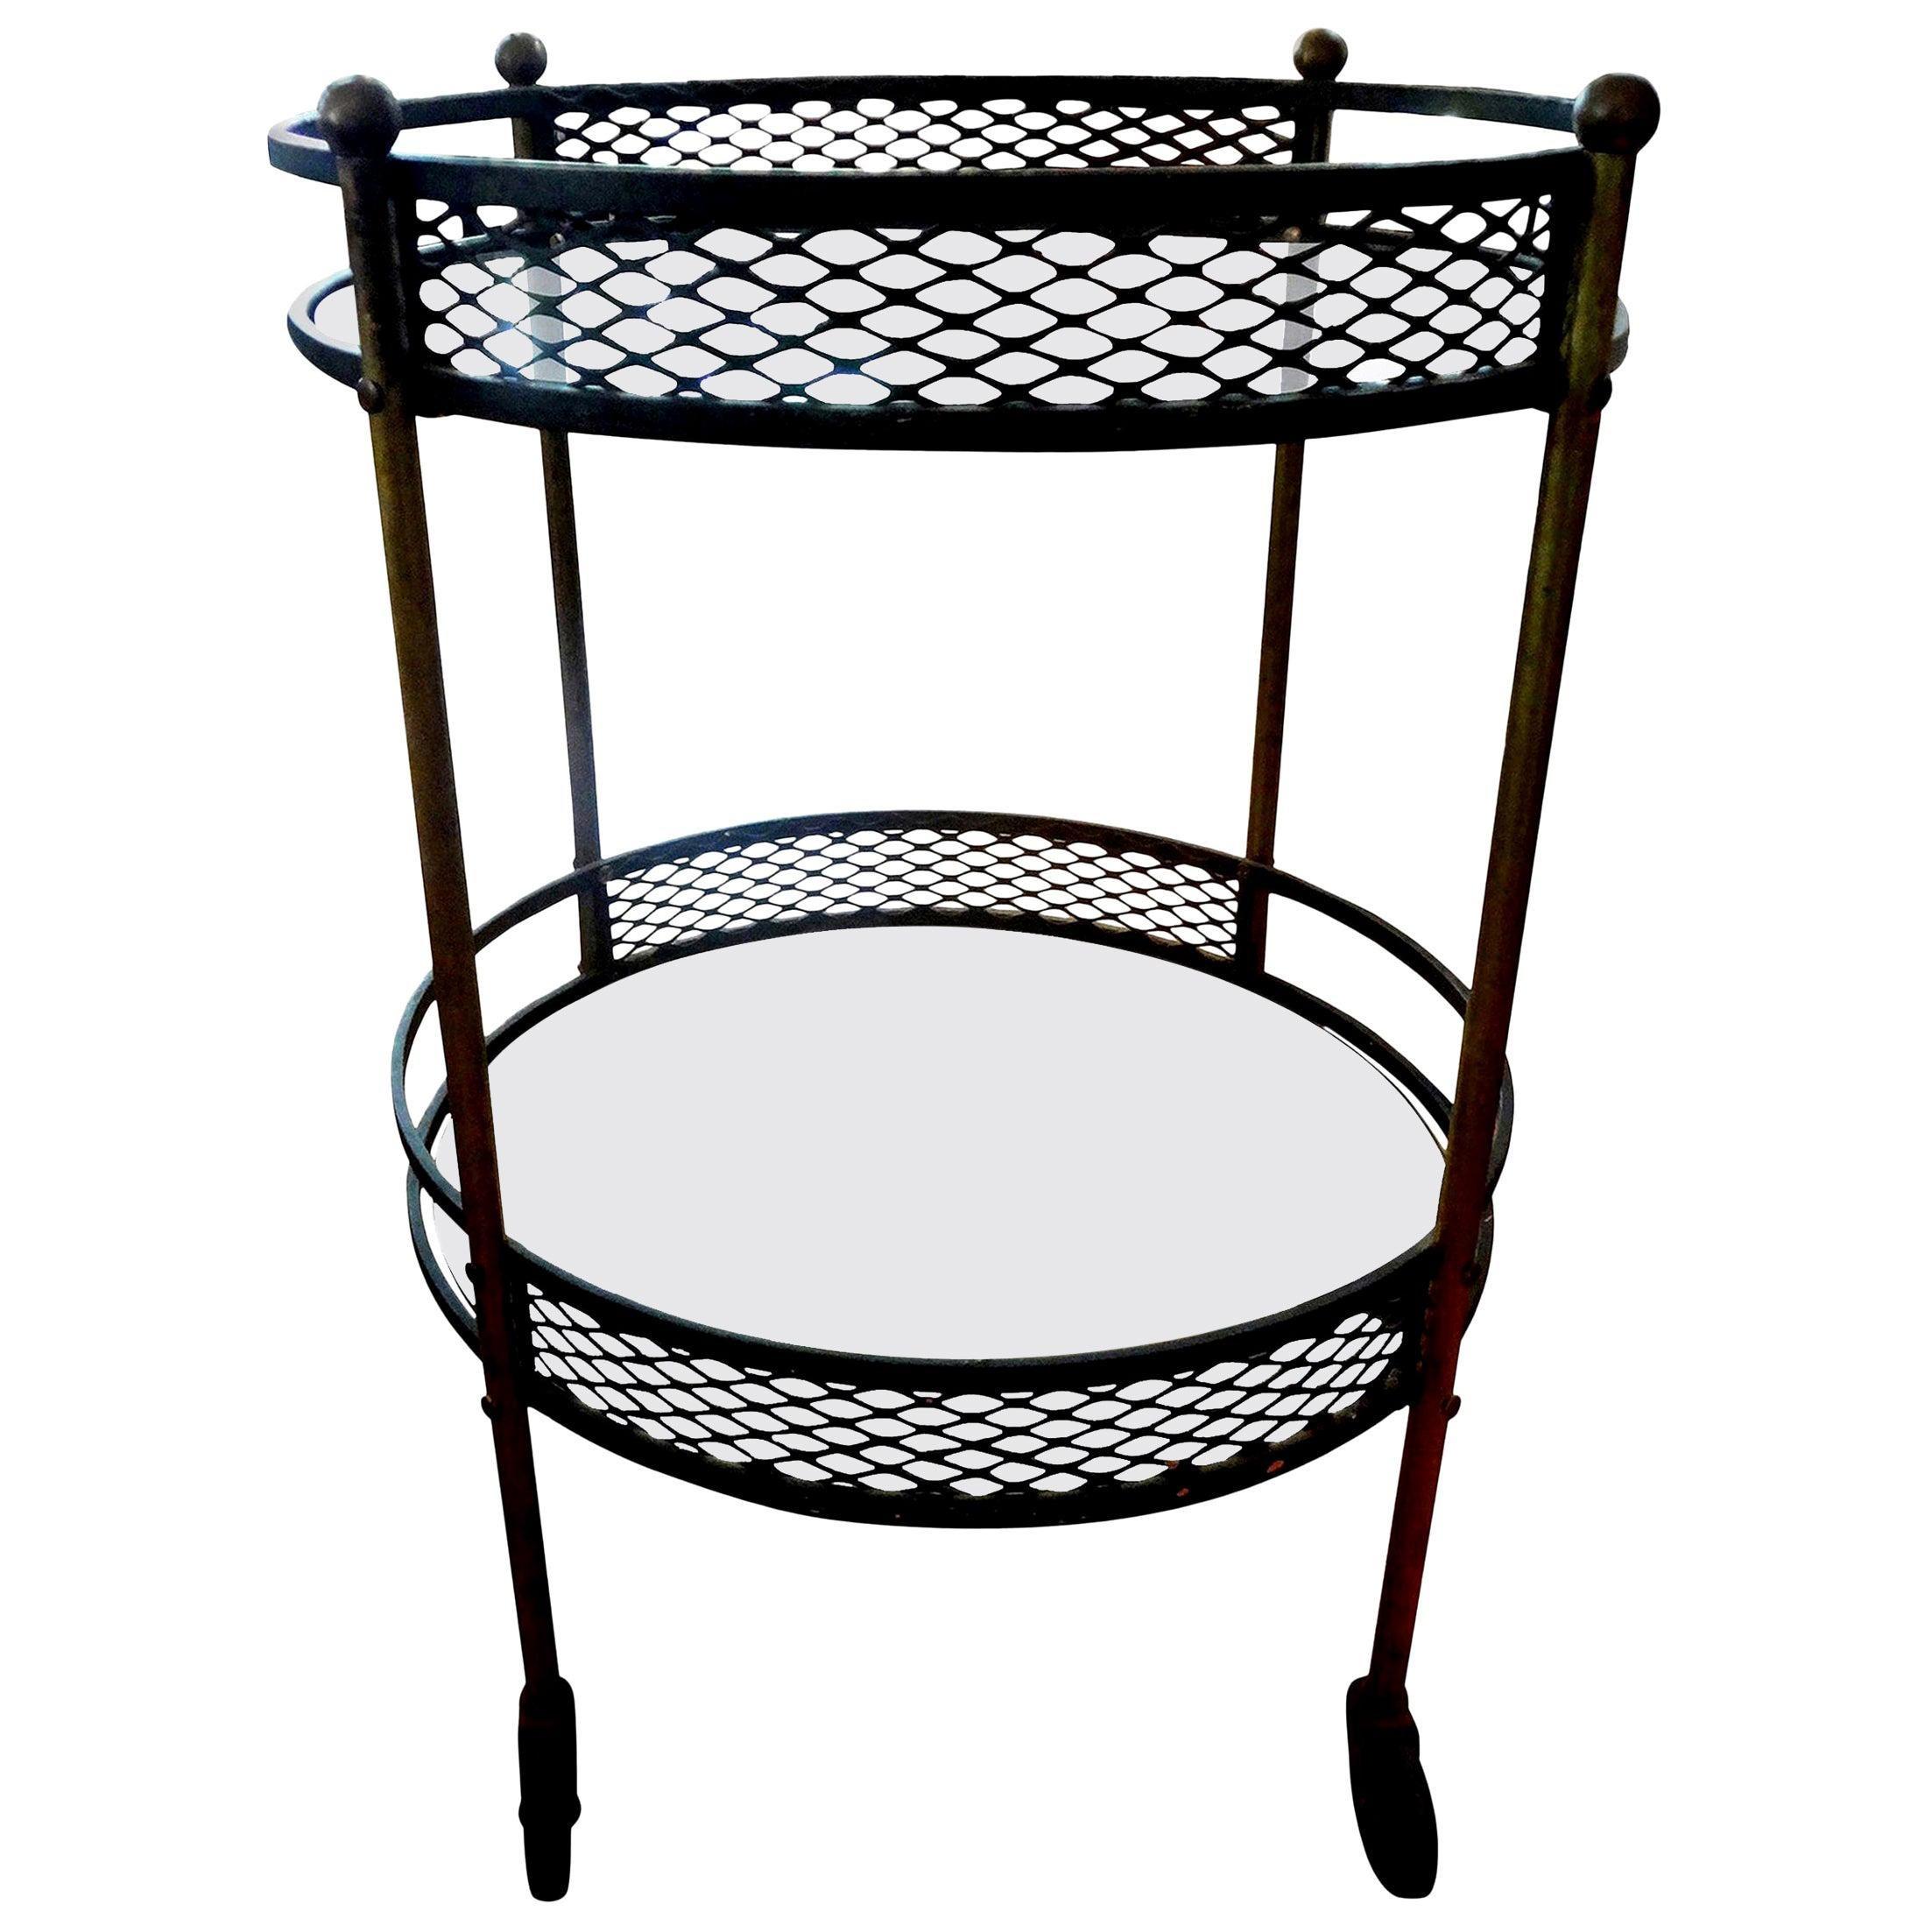 French Iron and Brass Bar Cart Attributed to Mathieu Matégot